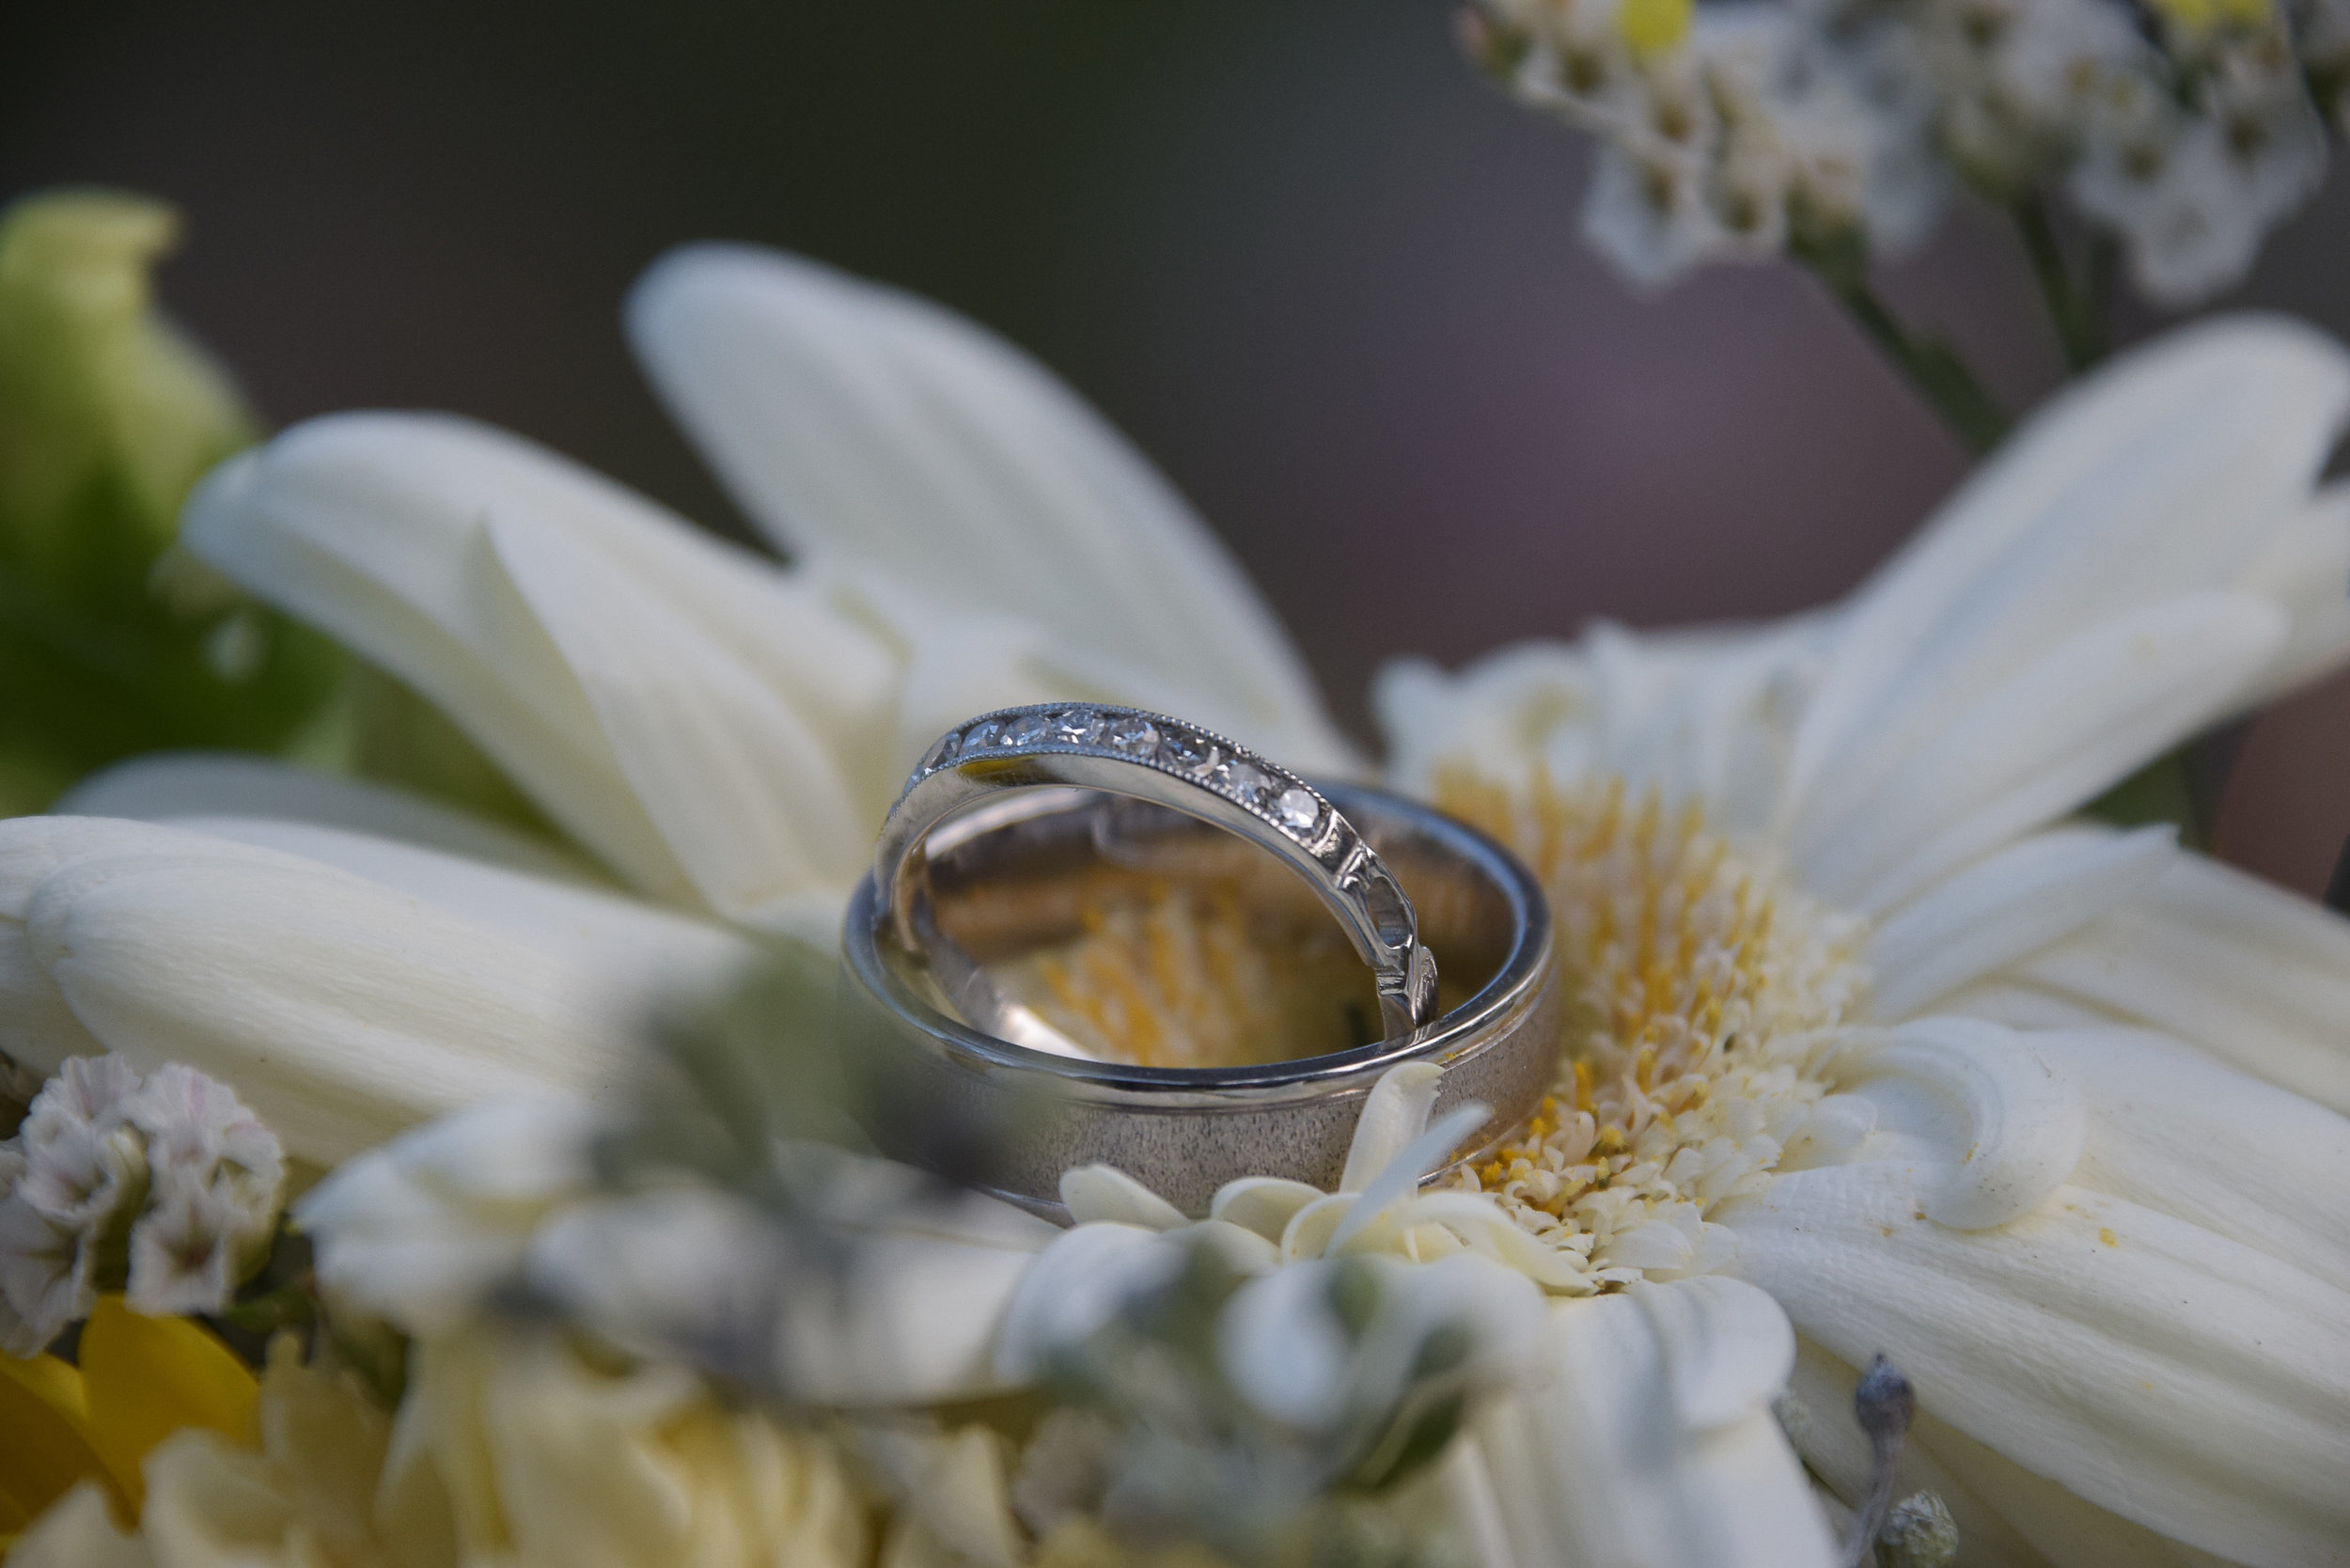 Macro shot of wedding rings.